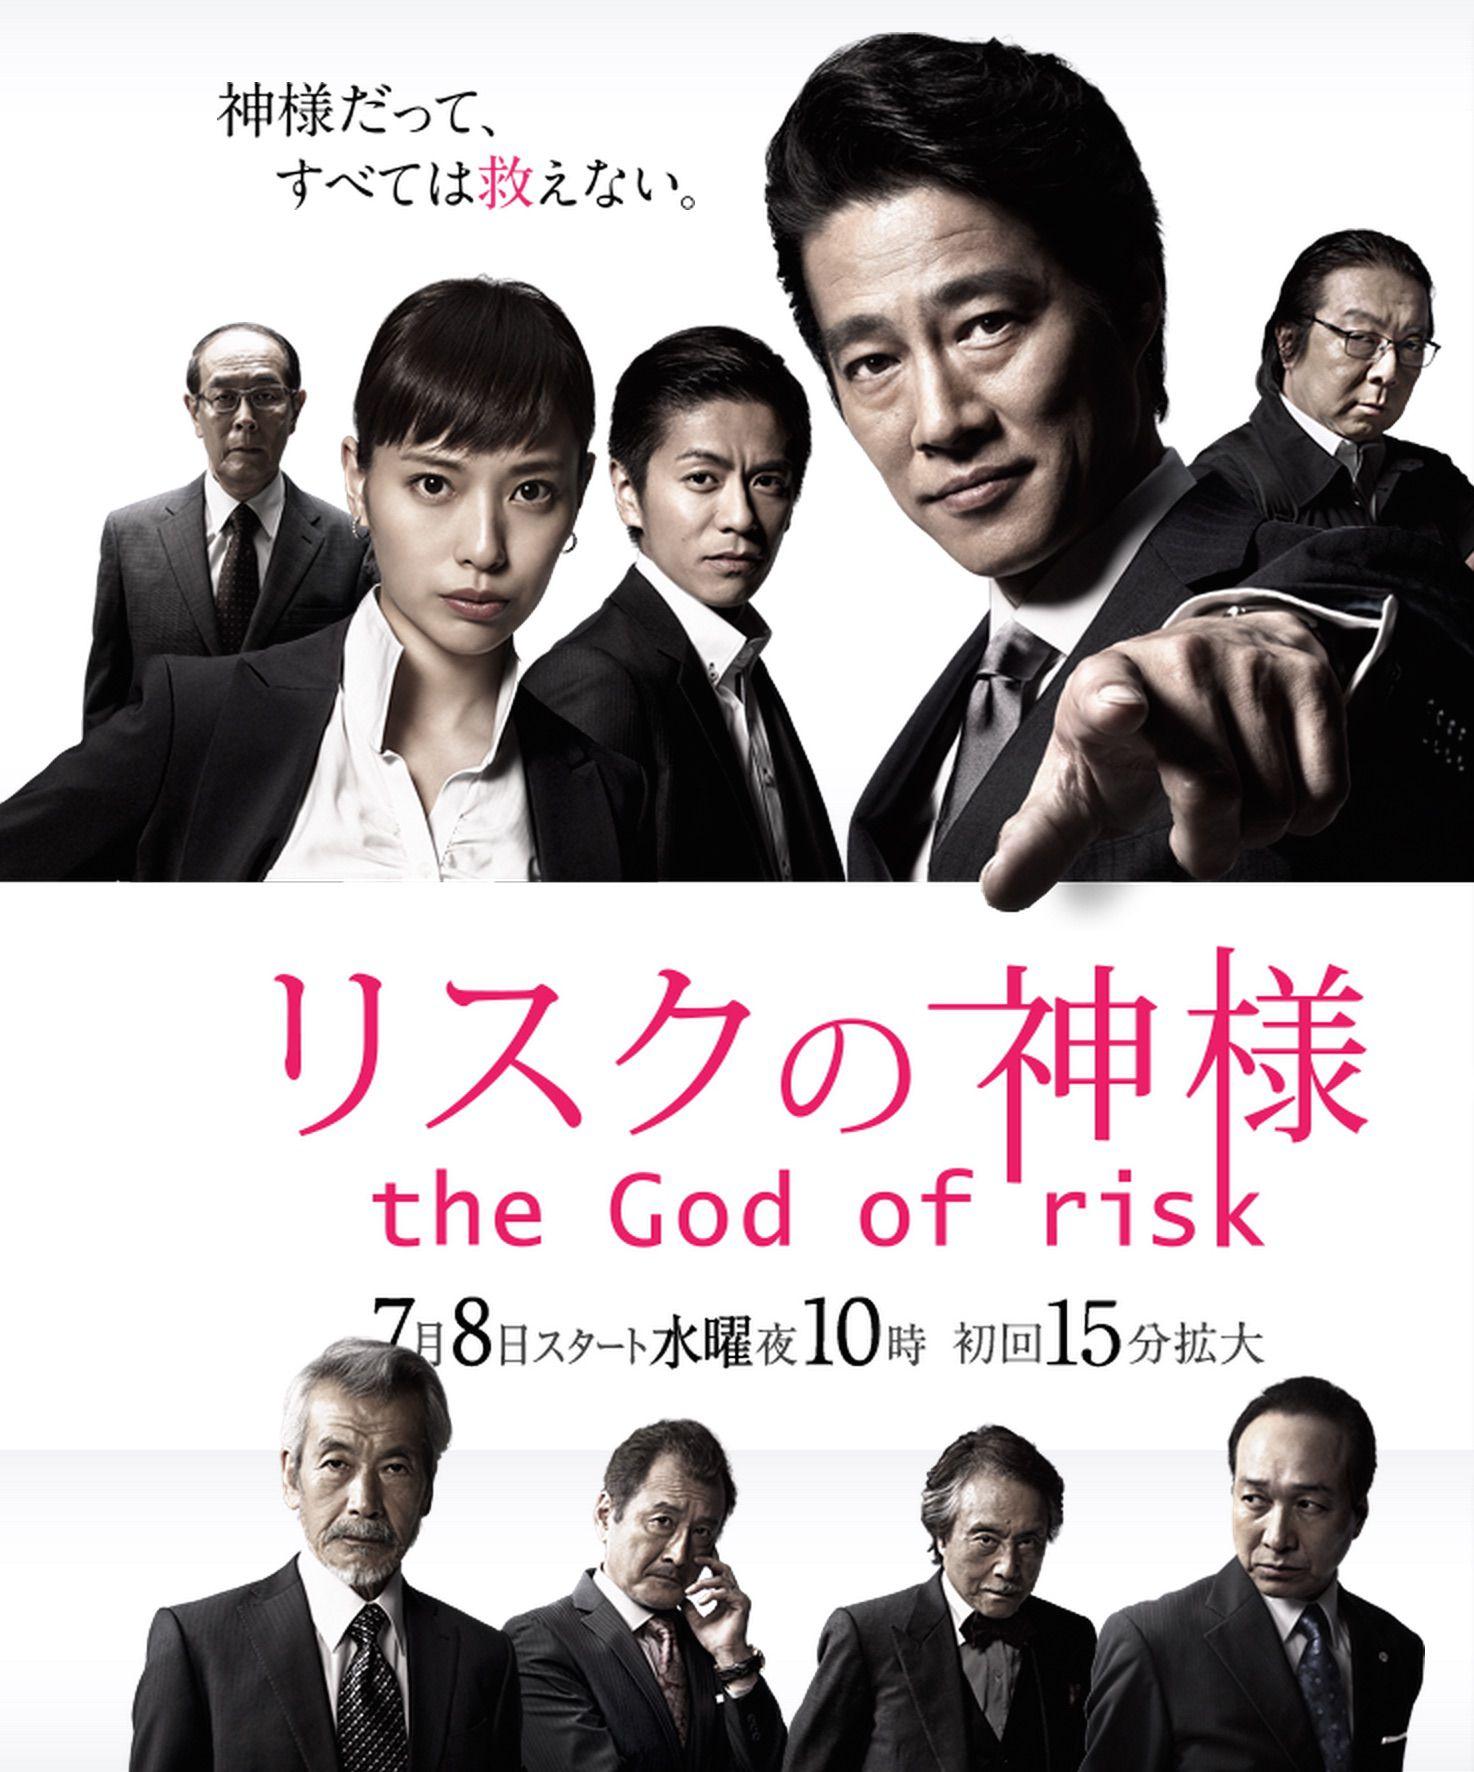 J Drama Ideal the god of risk - asianwiki